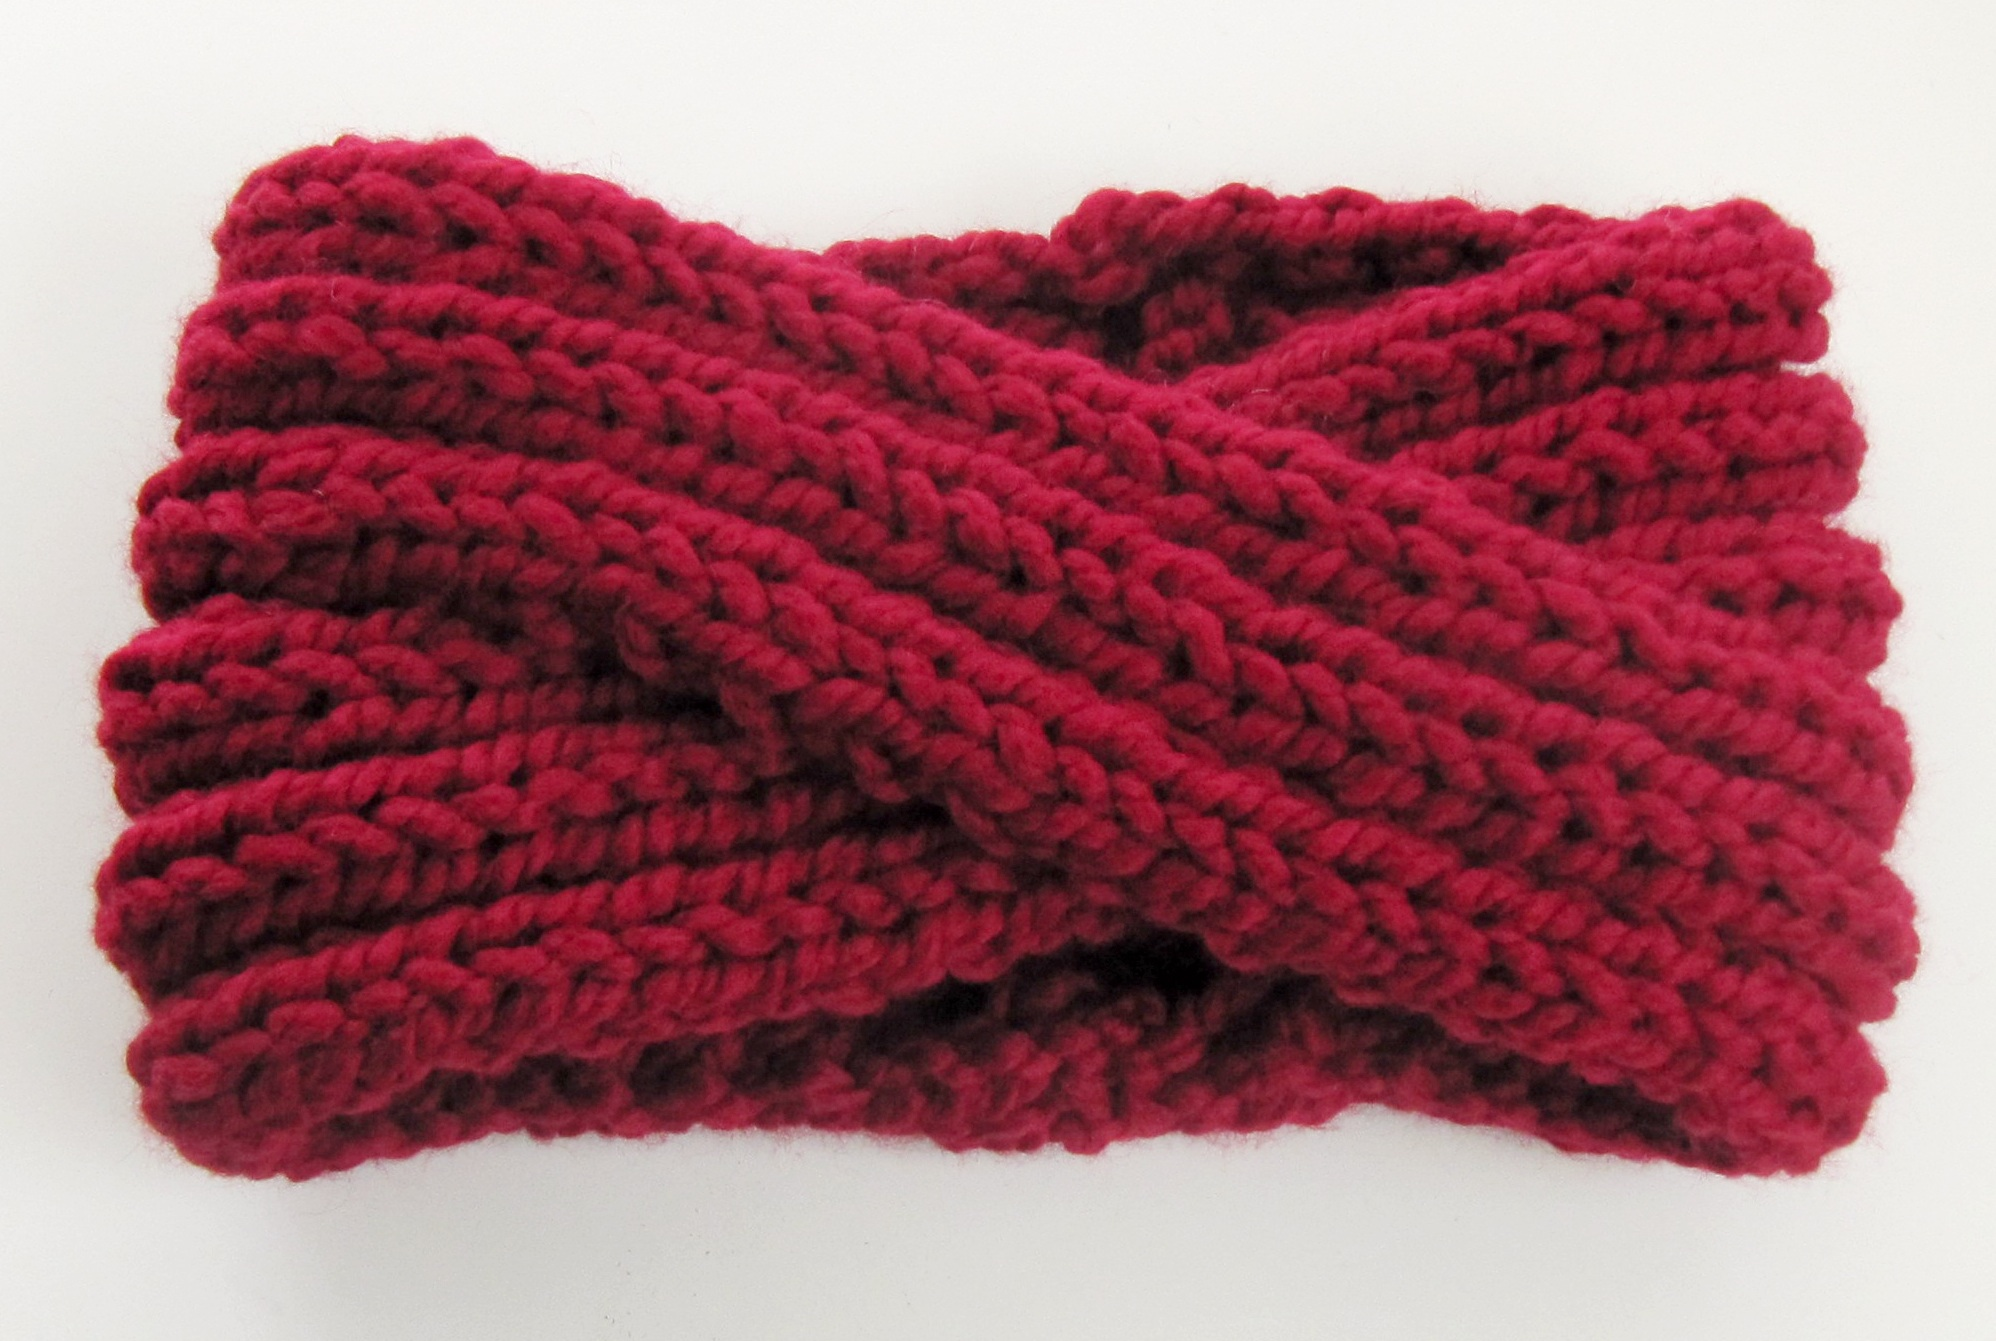 Headband Knit Patterns : chunky knit turban headband ear warmer KNITS FOR LIFE